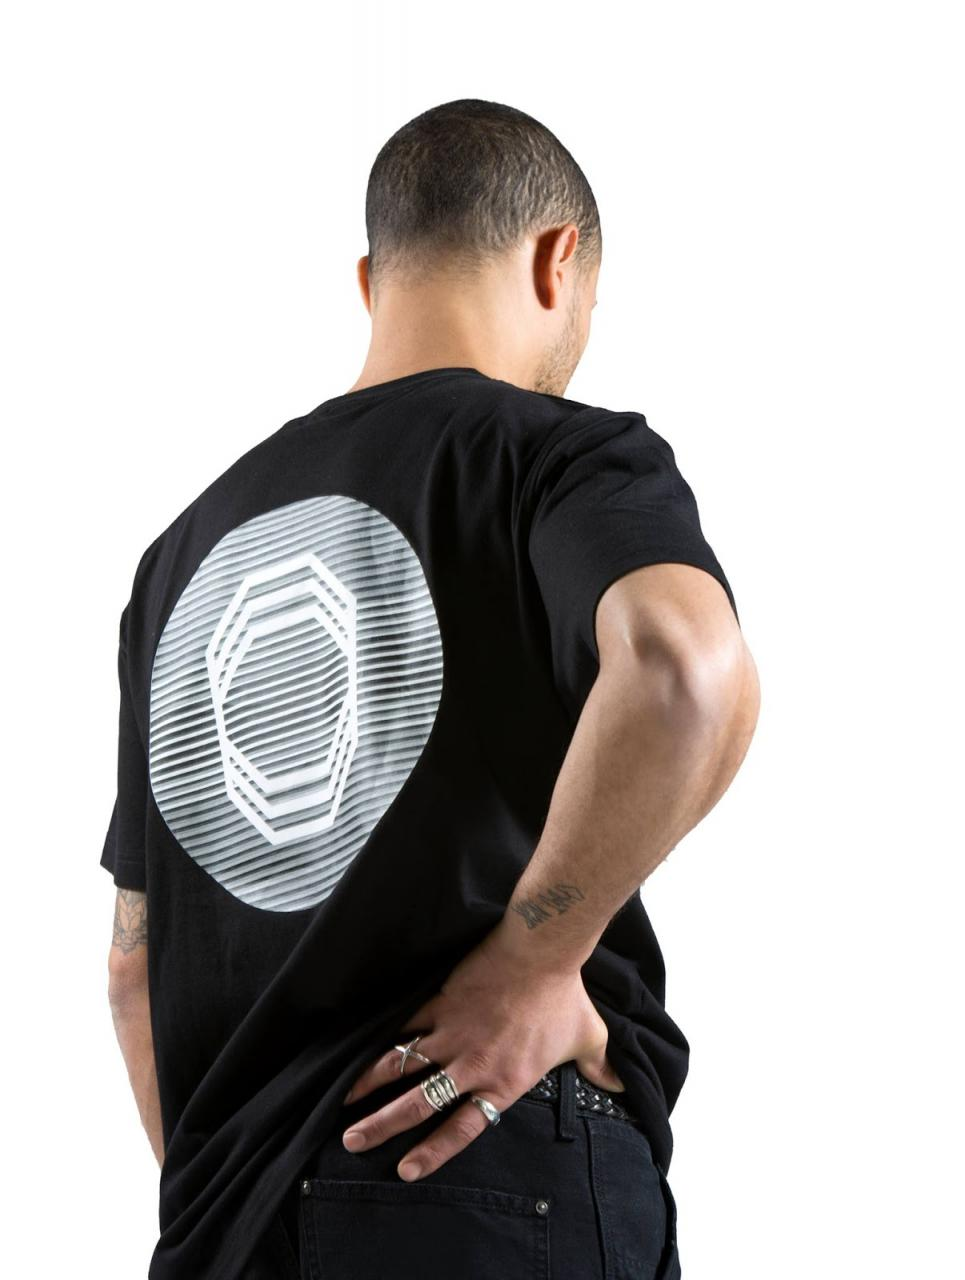 octagon ss16 streetwear brasil 09 - Öctagon mantém estética clean e futurista